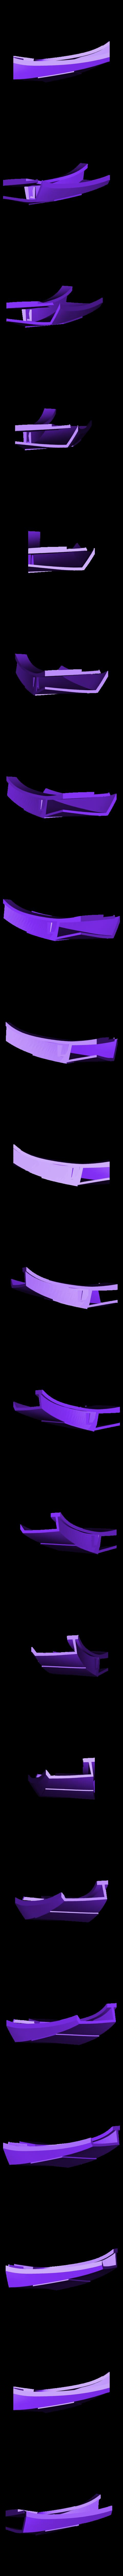 Part 17 v1.stl Download STL file ARF Trooper Helmet • 3D print object, VillainousPropShop